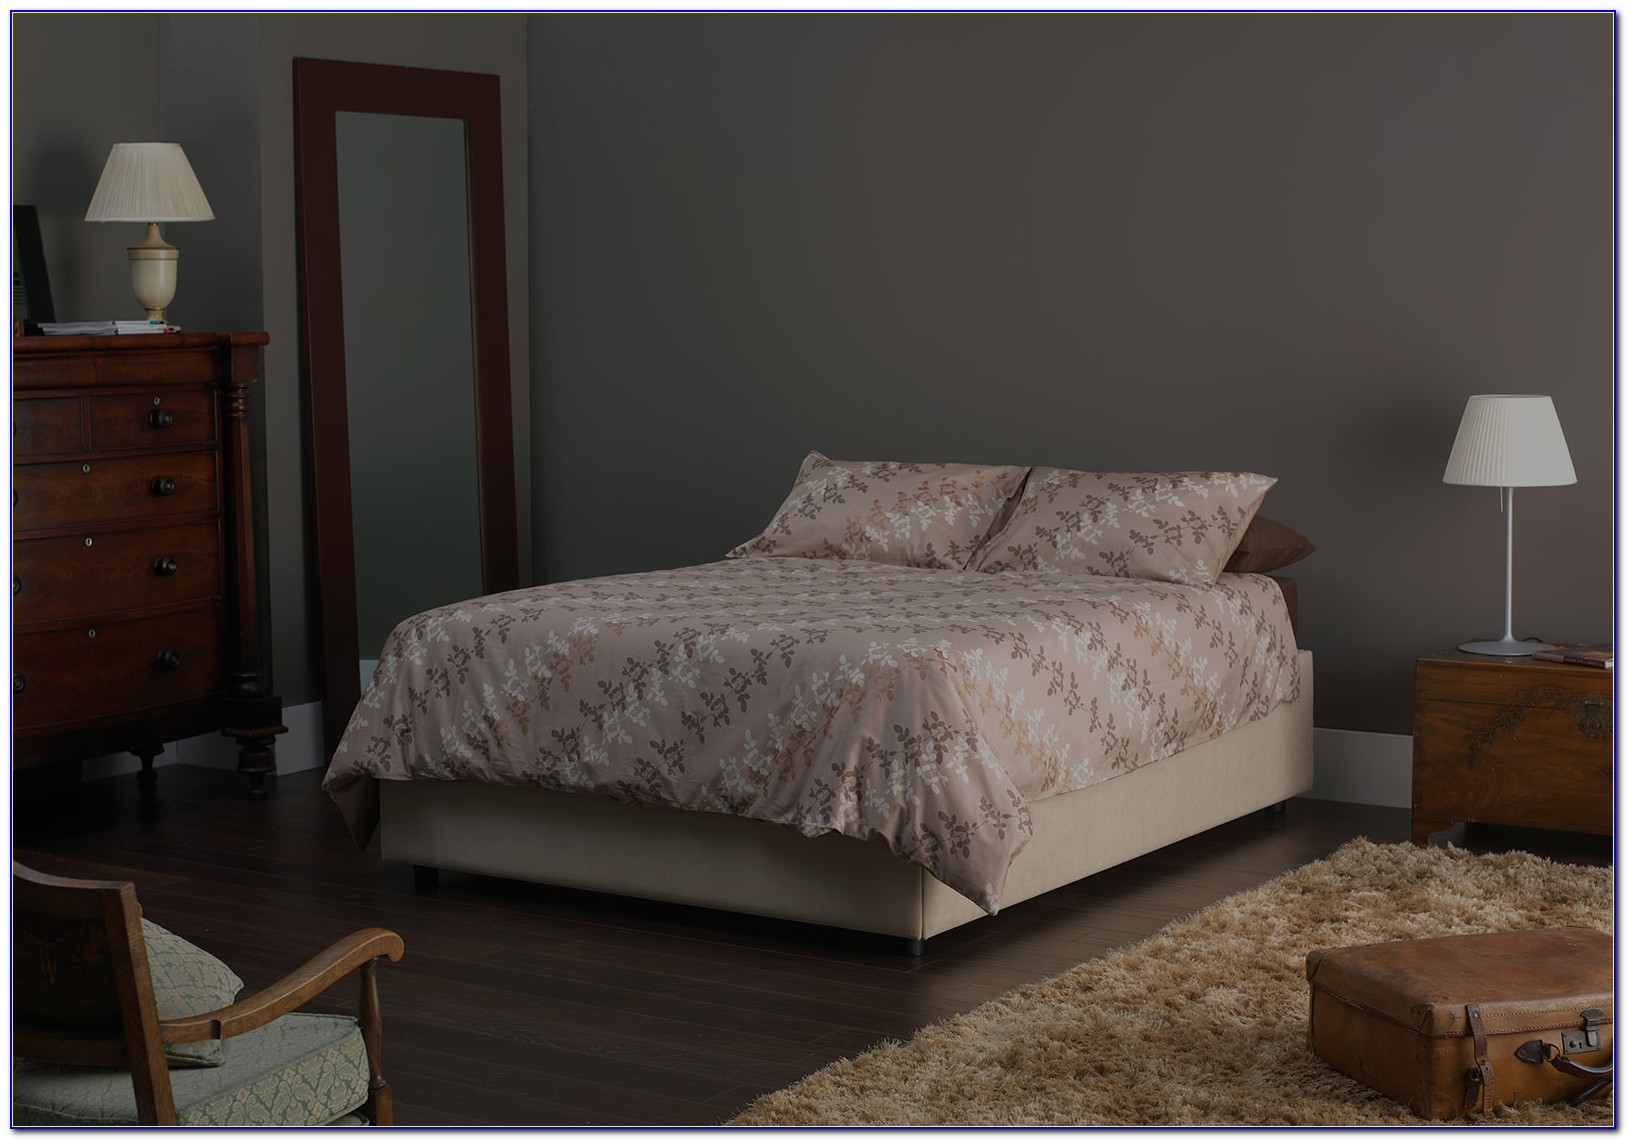 Ottoman Storage Bed No Headboard